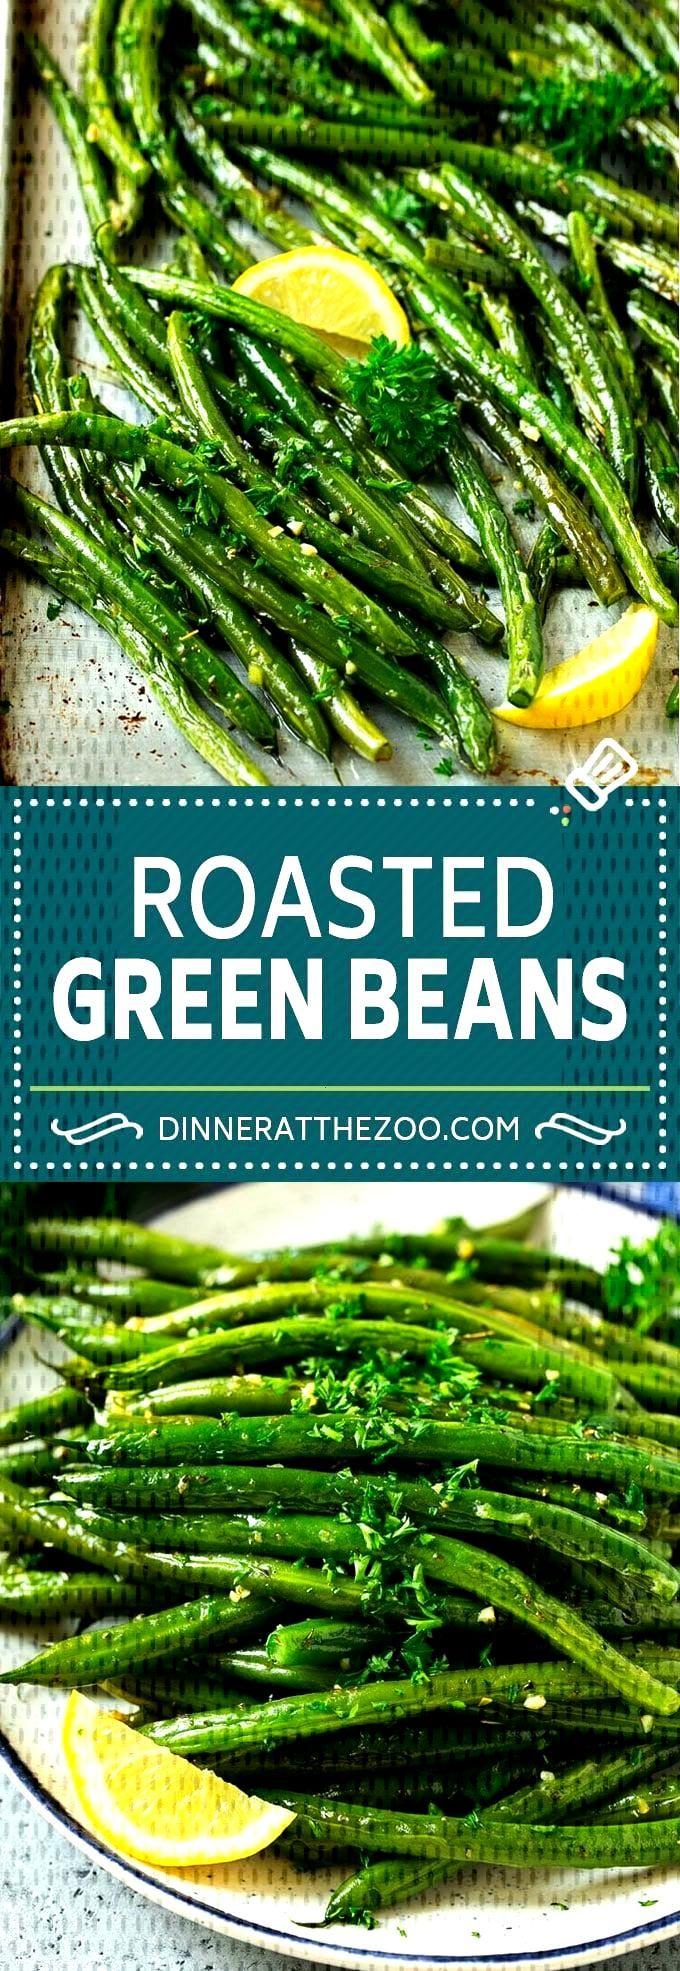 Roasted Green Beans Recipe | Garlic Green Beans | Easy Green Beans